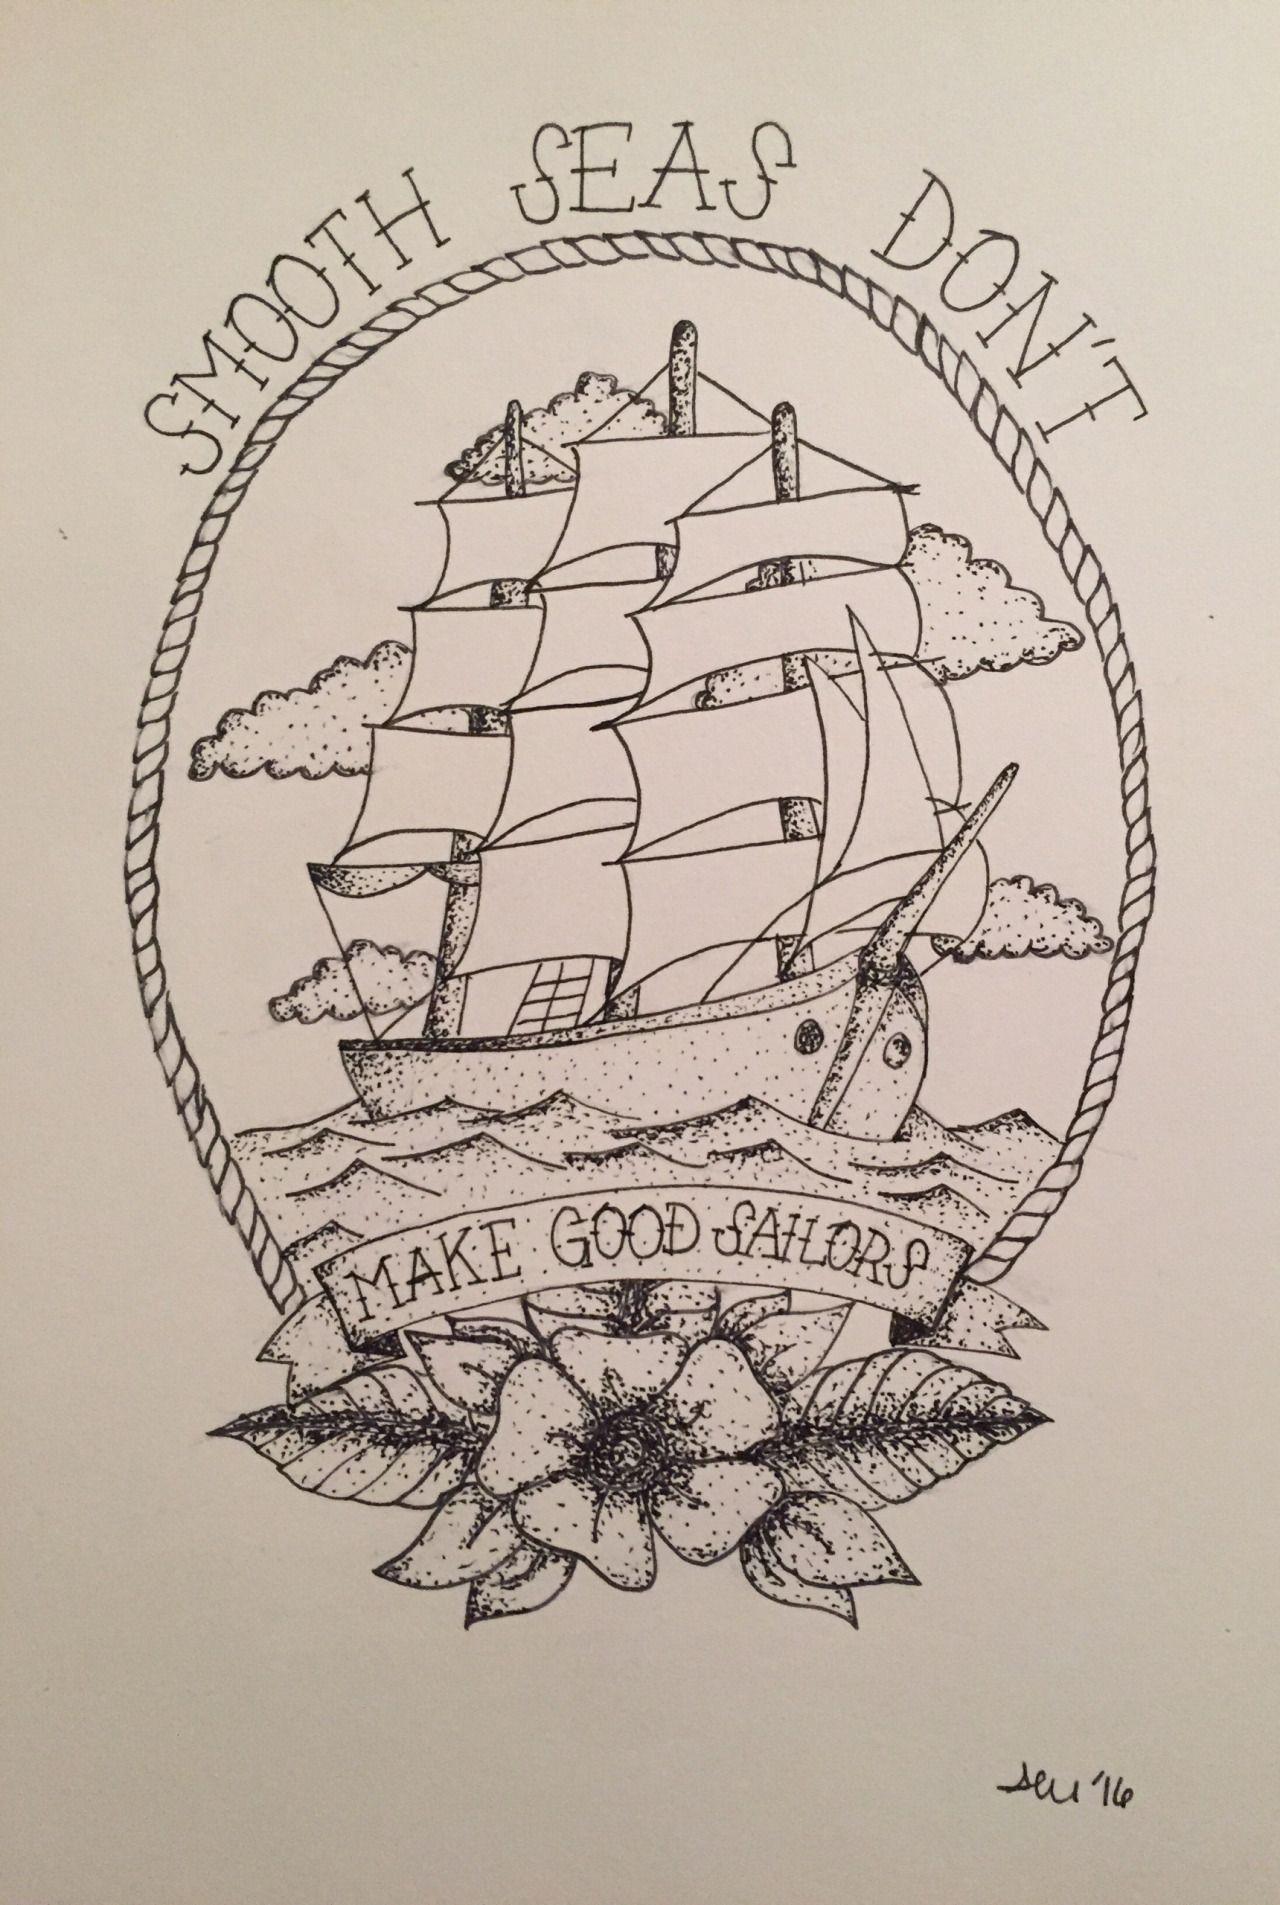 tattoo design smooth seas don't make good sailors / neck